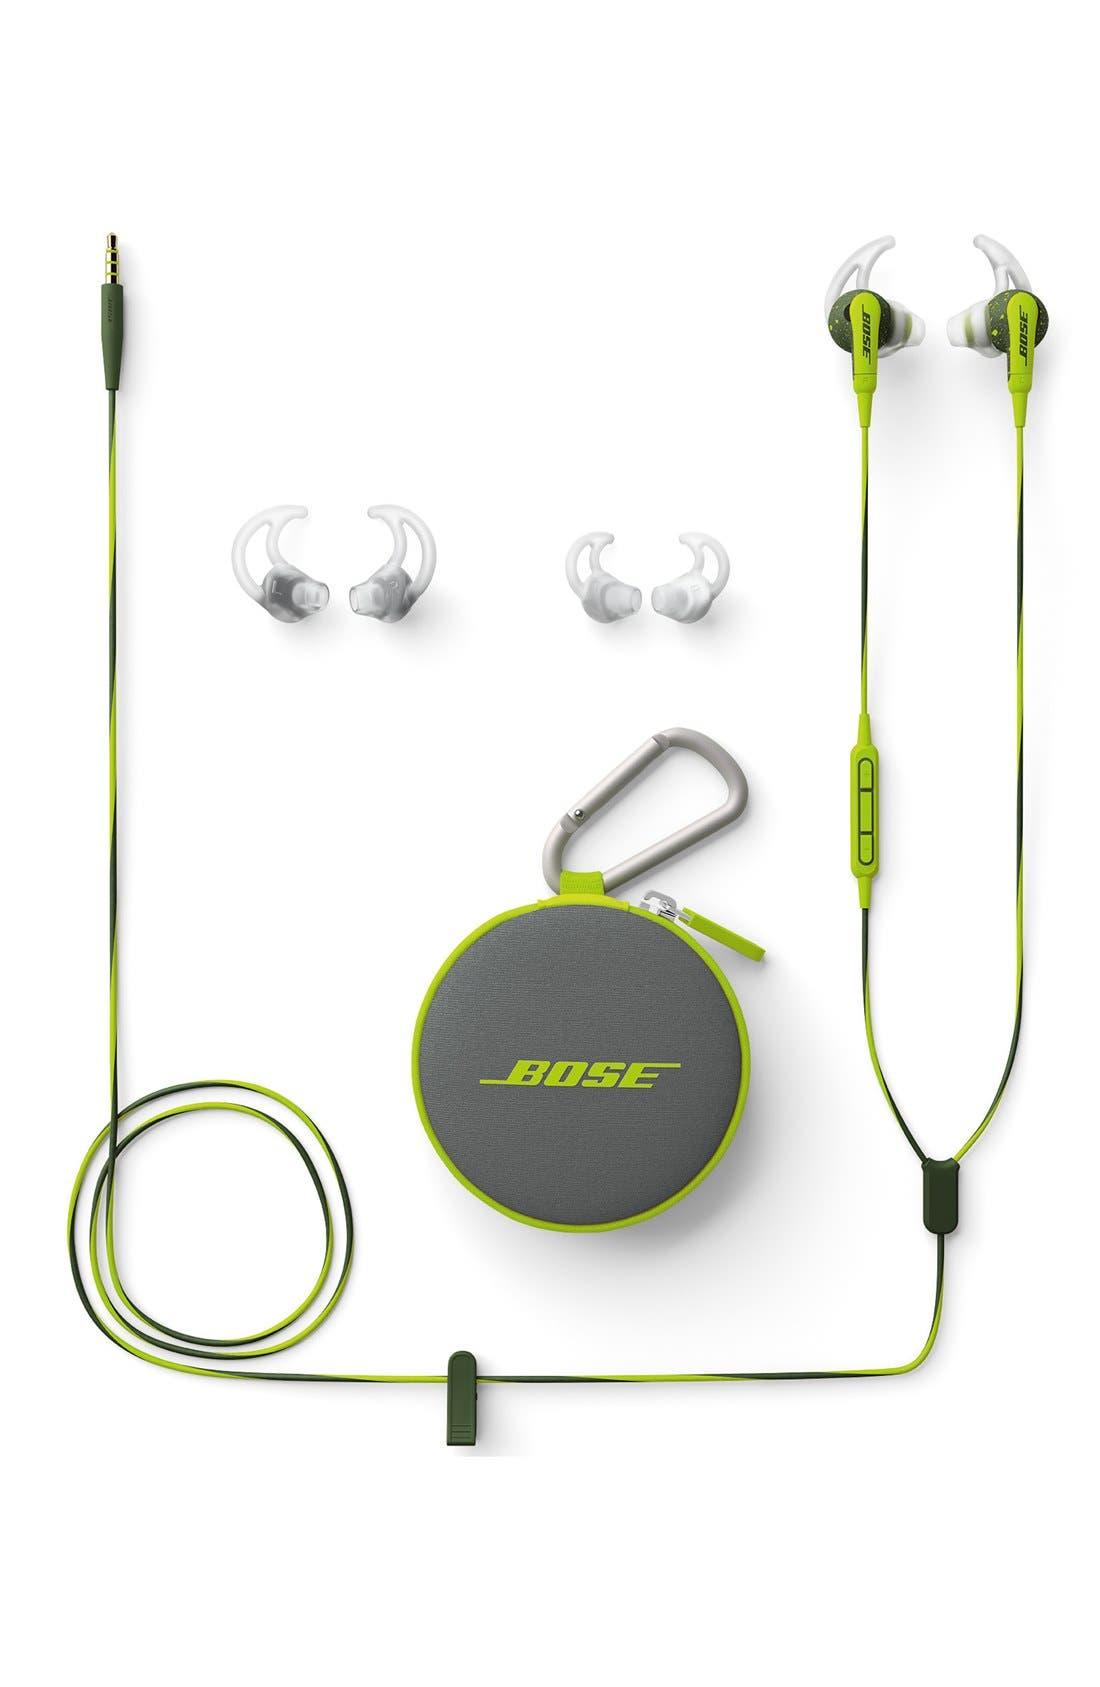 SoundSport<sup>®</sup> In-Ear Headphones,                             Alternate thumbnail 5, color,                             300